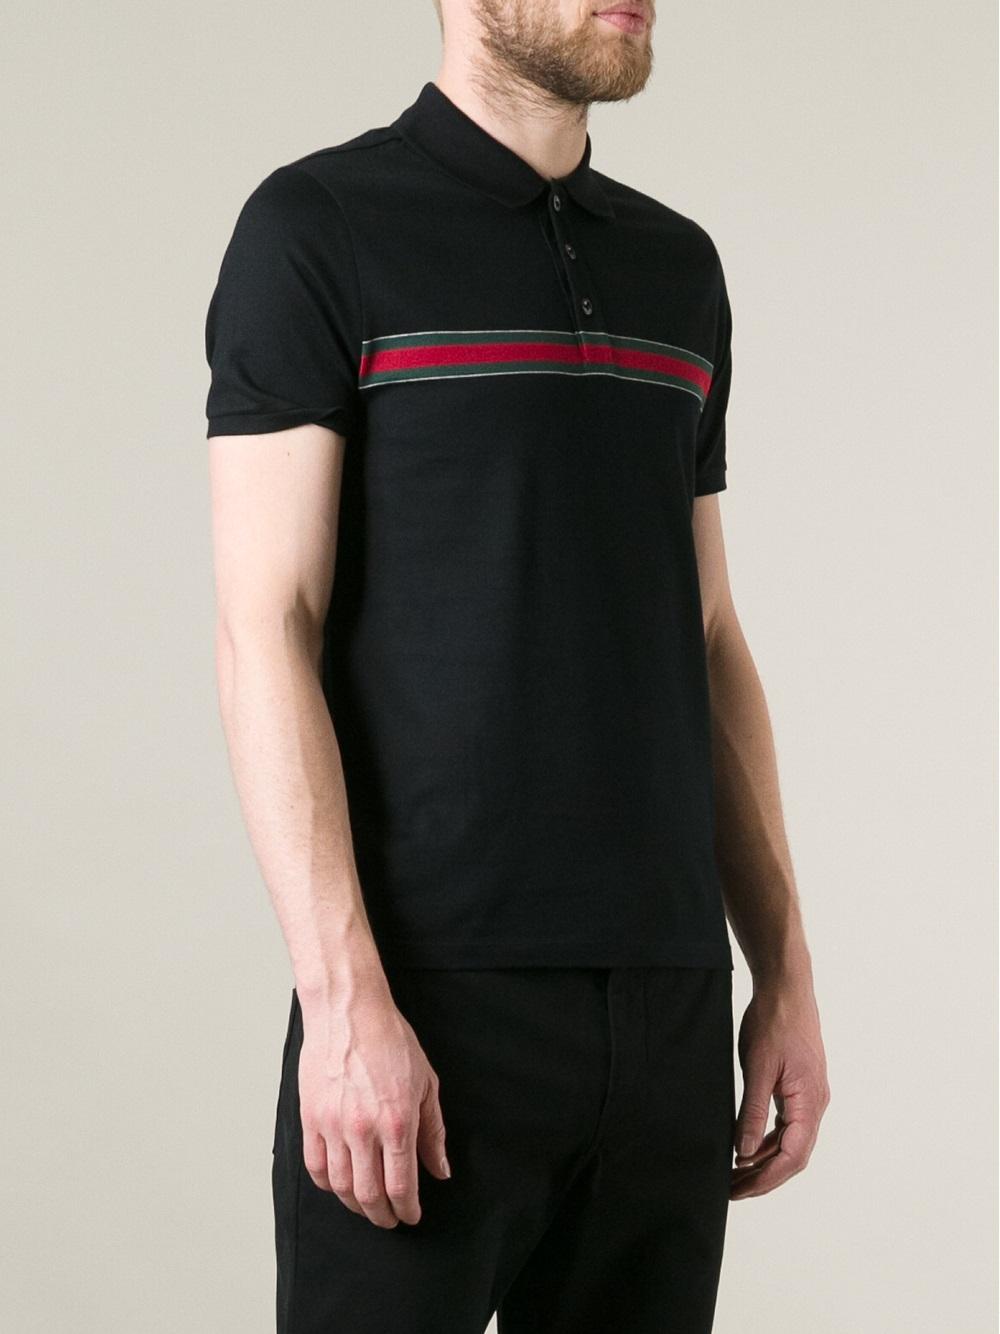 Burberry Dress Shirt For Men